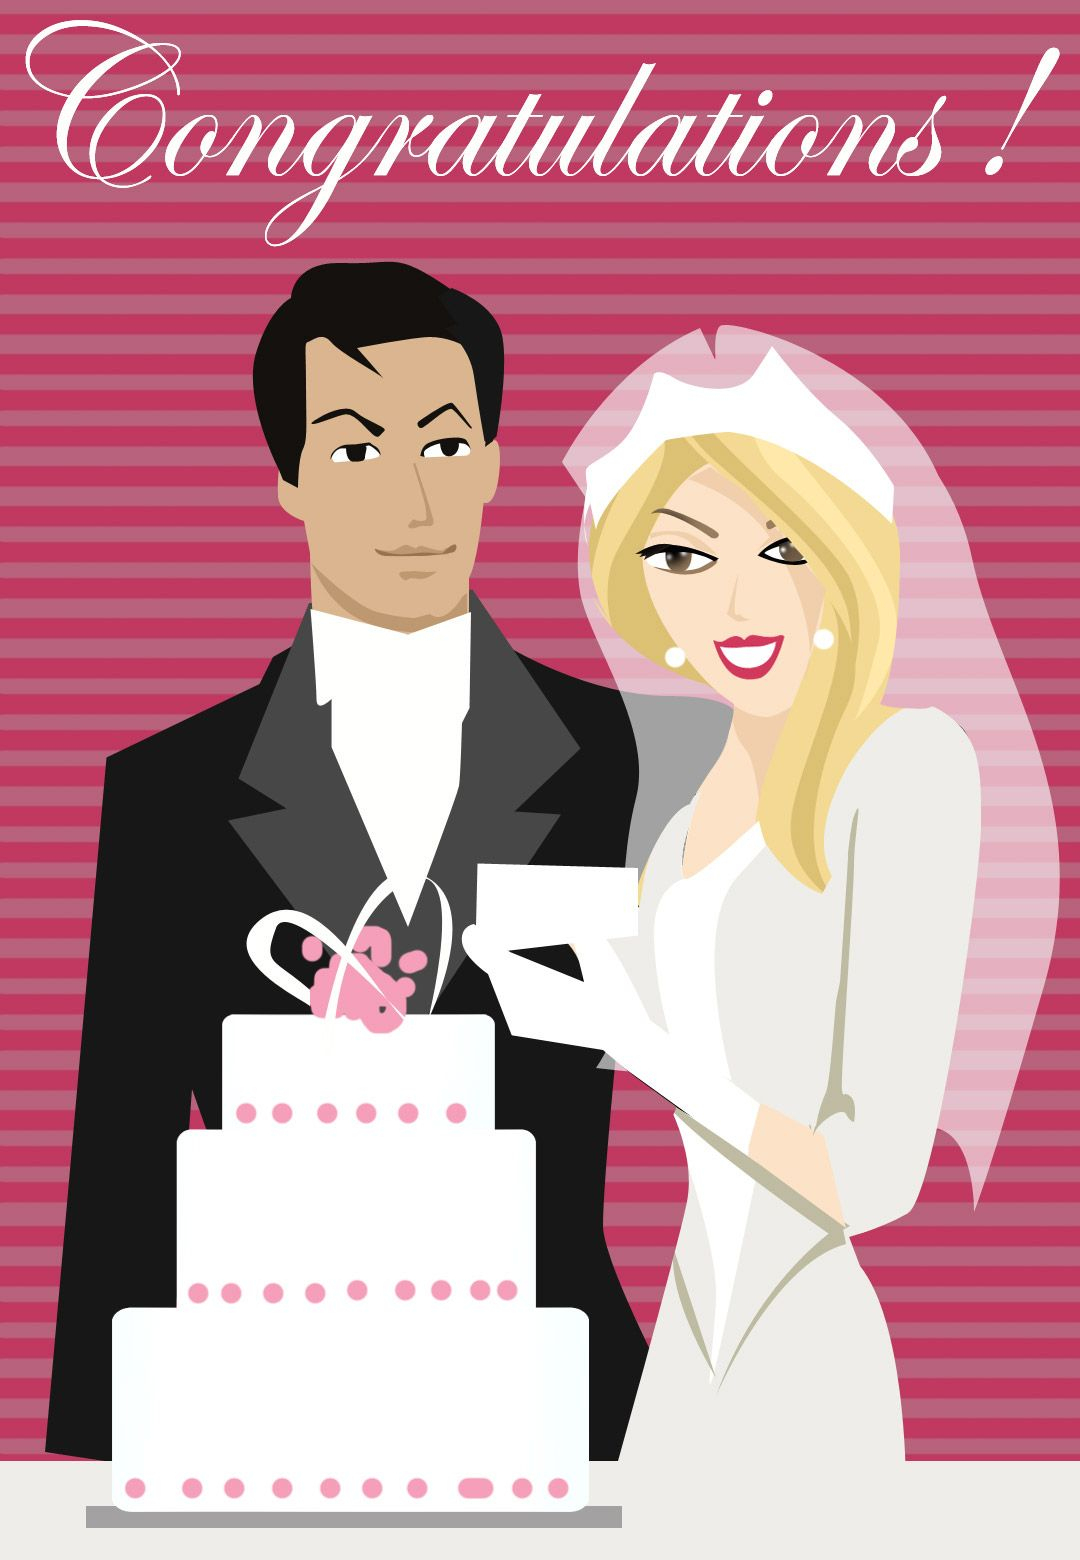 Free Printable Congratulations Greeting Card | Wedding Cards To - Free Printable Wedding Congratulations Greeting Cards